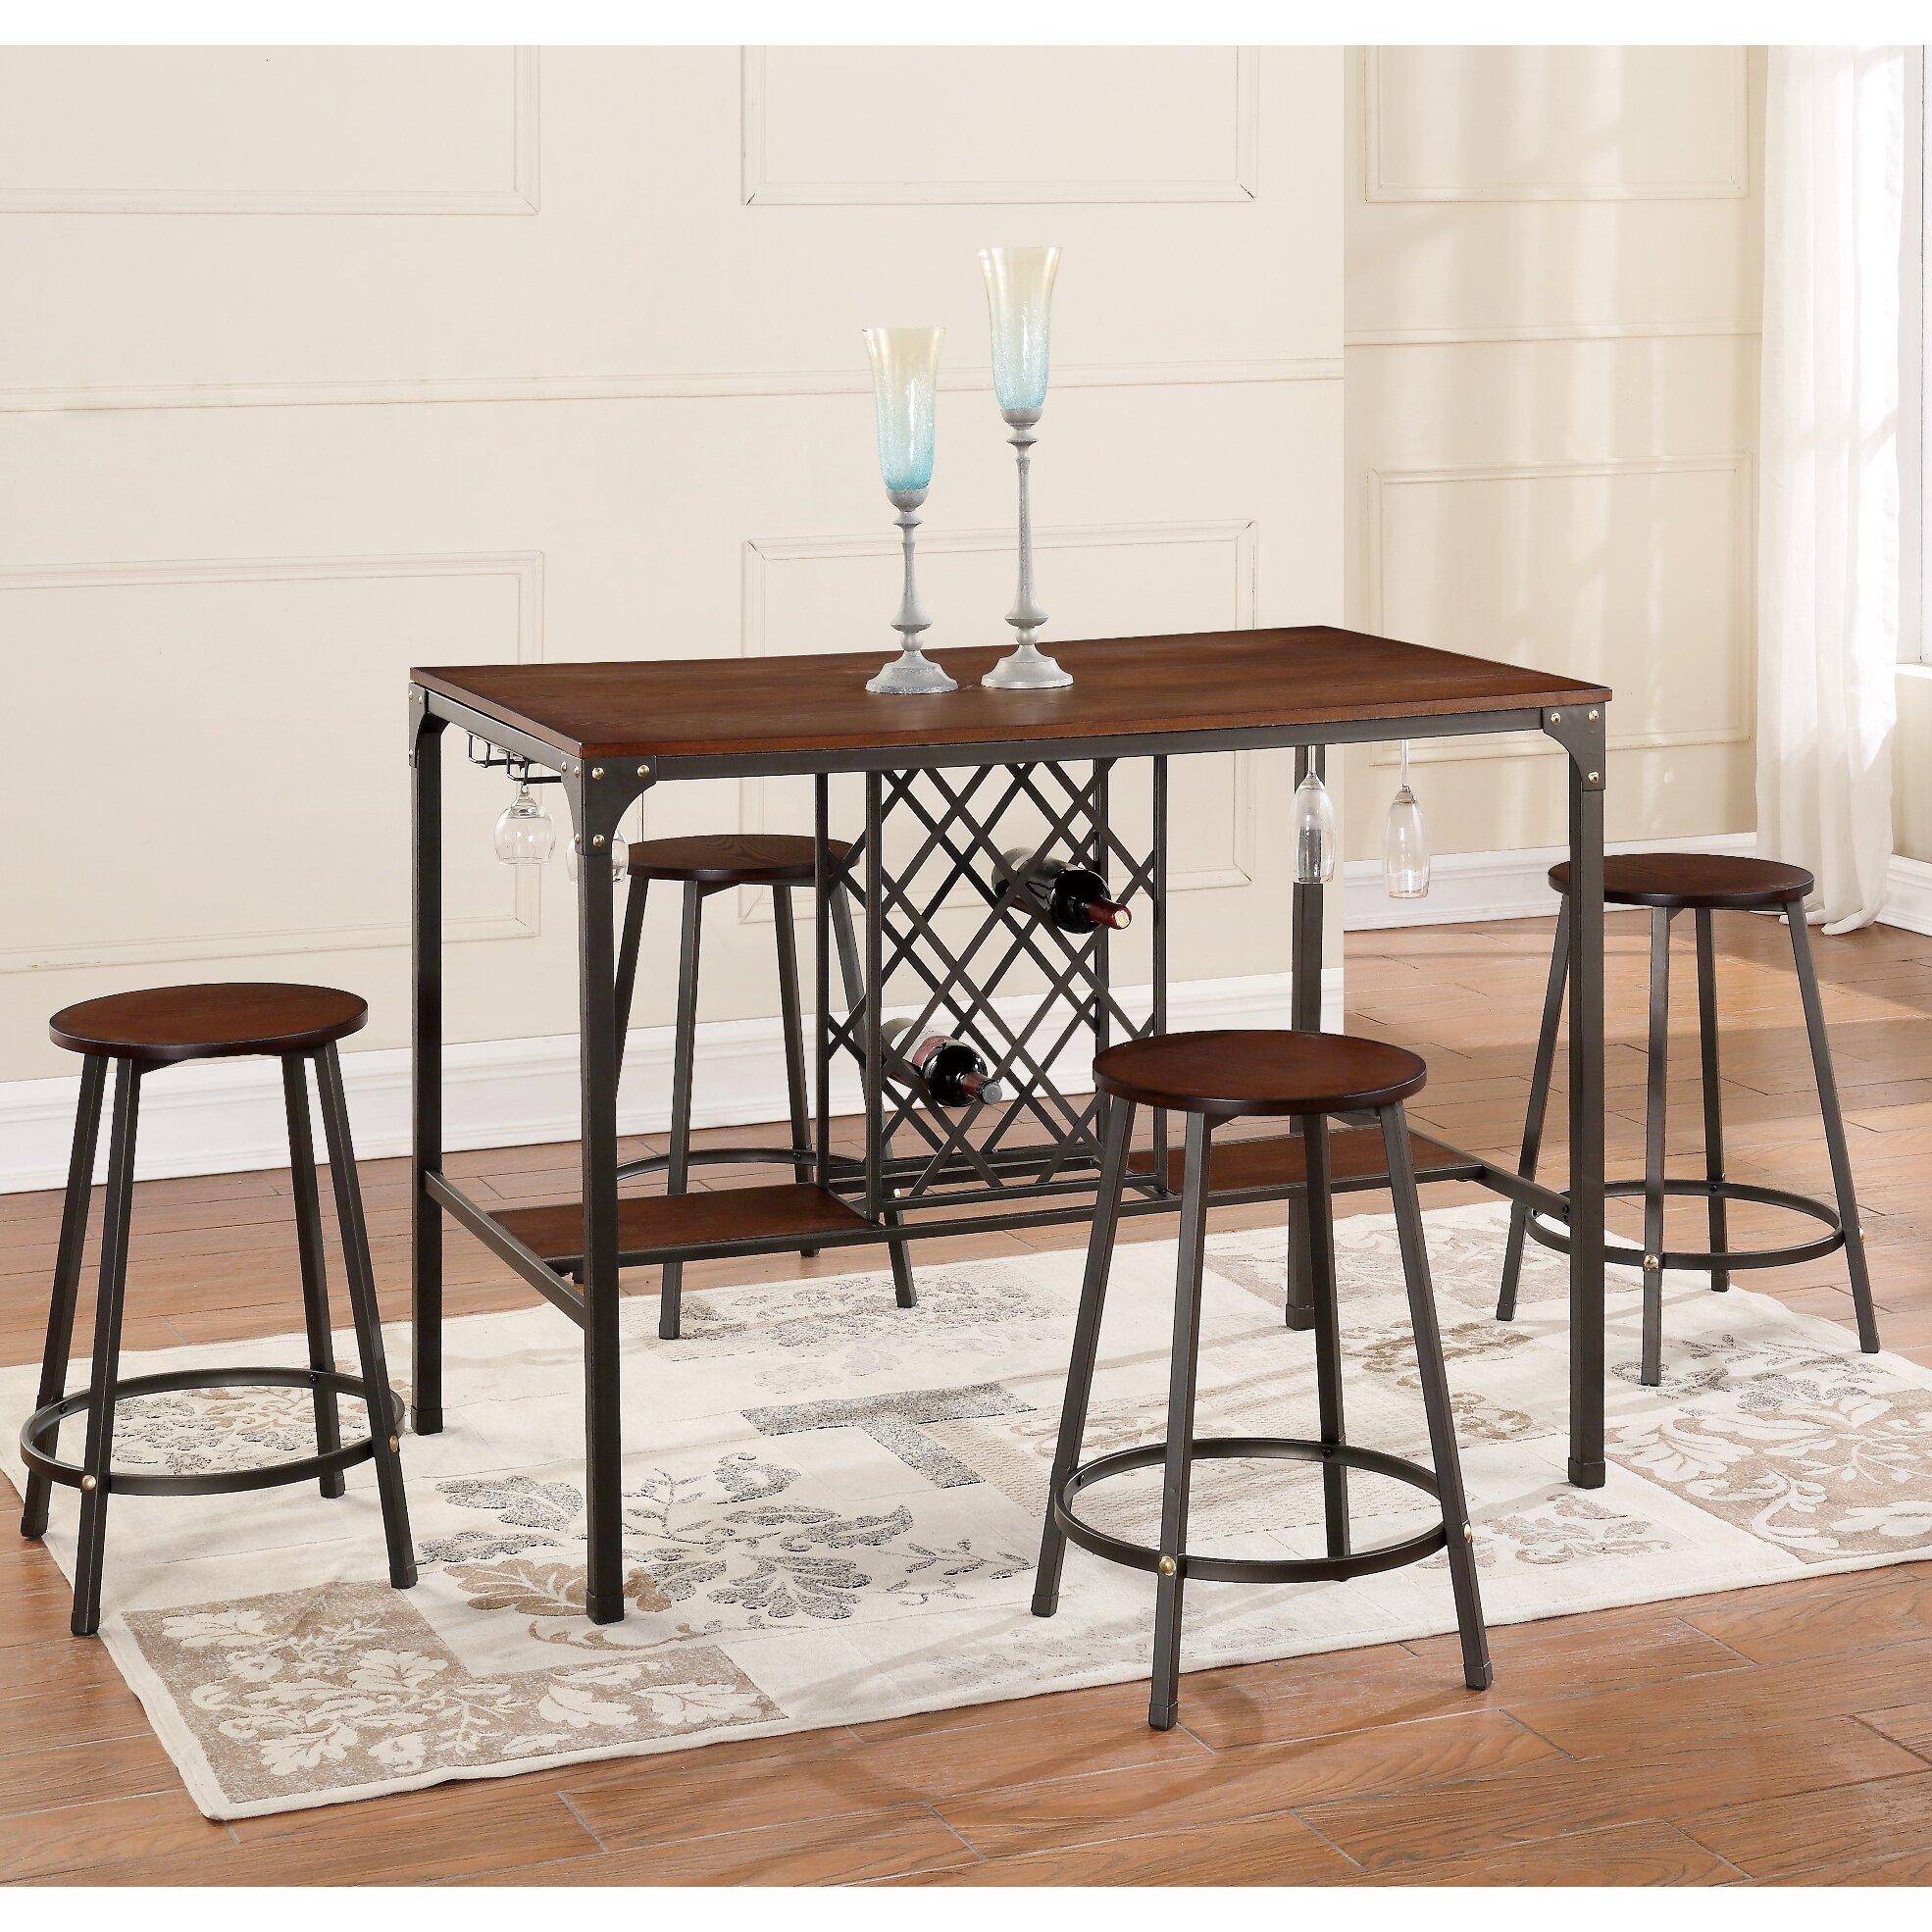 brayden studio littell 5 piece pub table set reviews wayfair. Black Bedroom Furniture Sets. Home Design Ideas